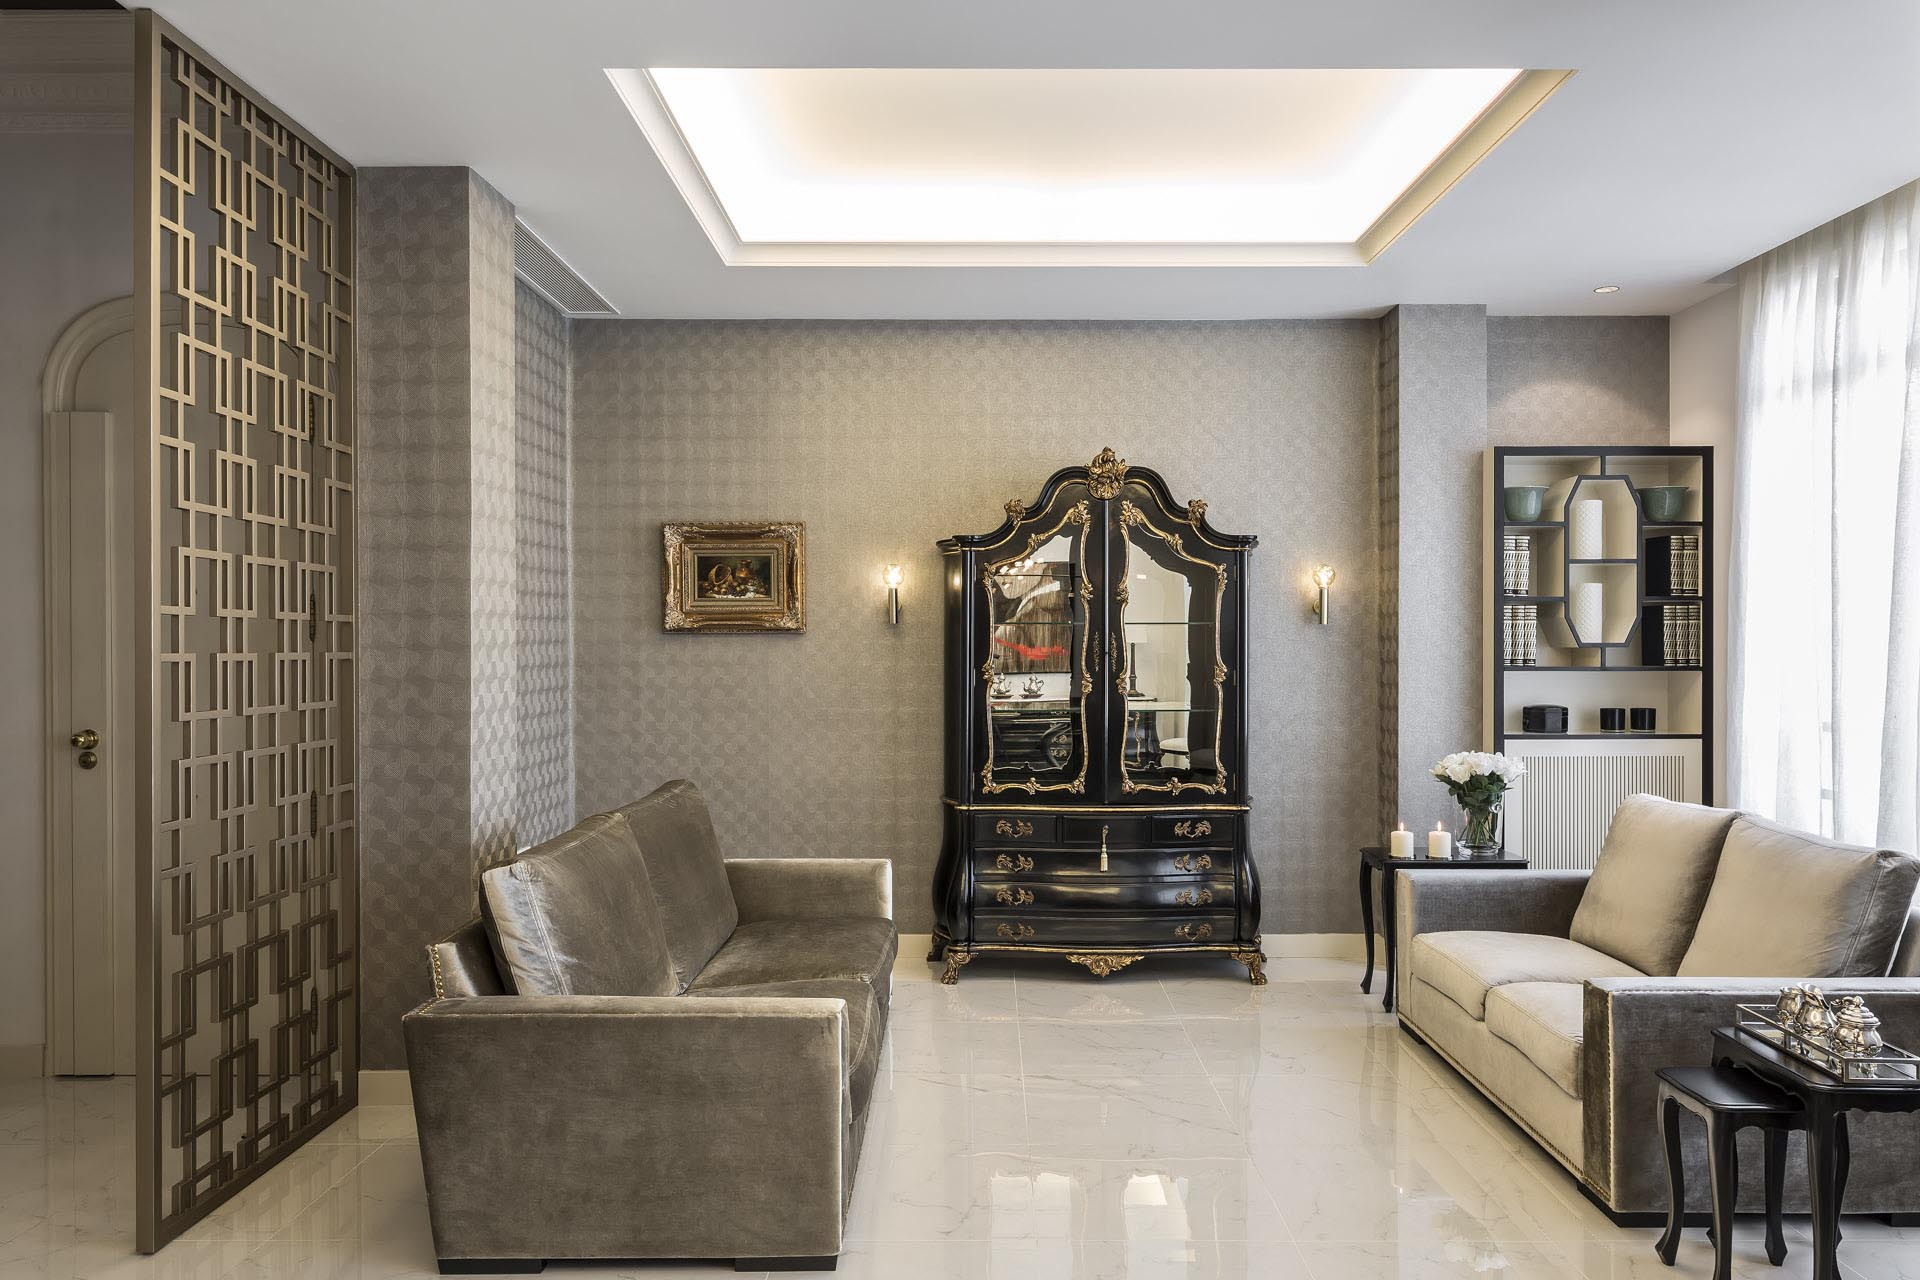 fotografia-arquitectura-valencia-interiorismo-german-cabo-laura-yerpes-apartamento-xx